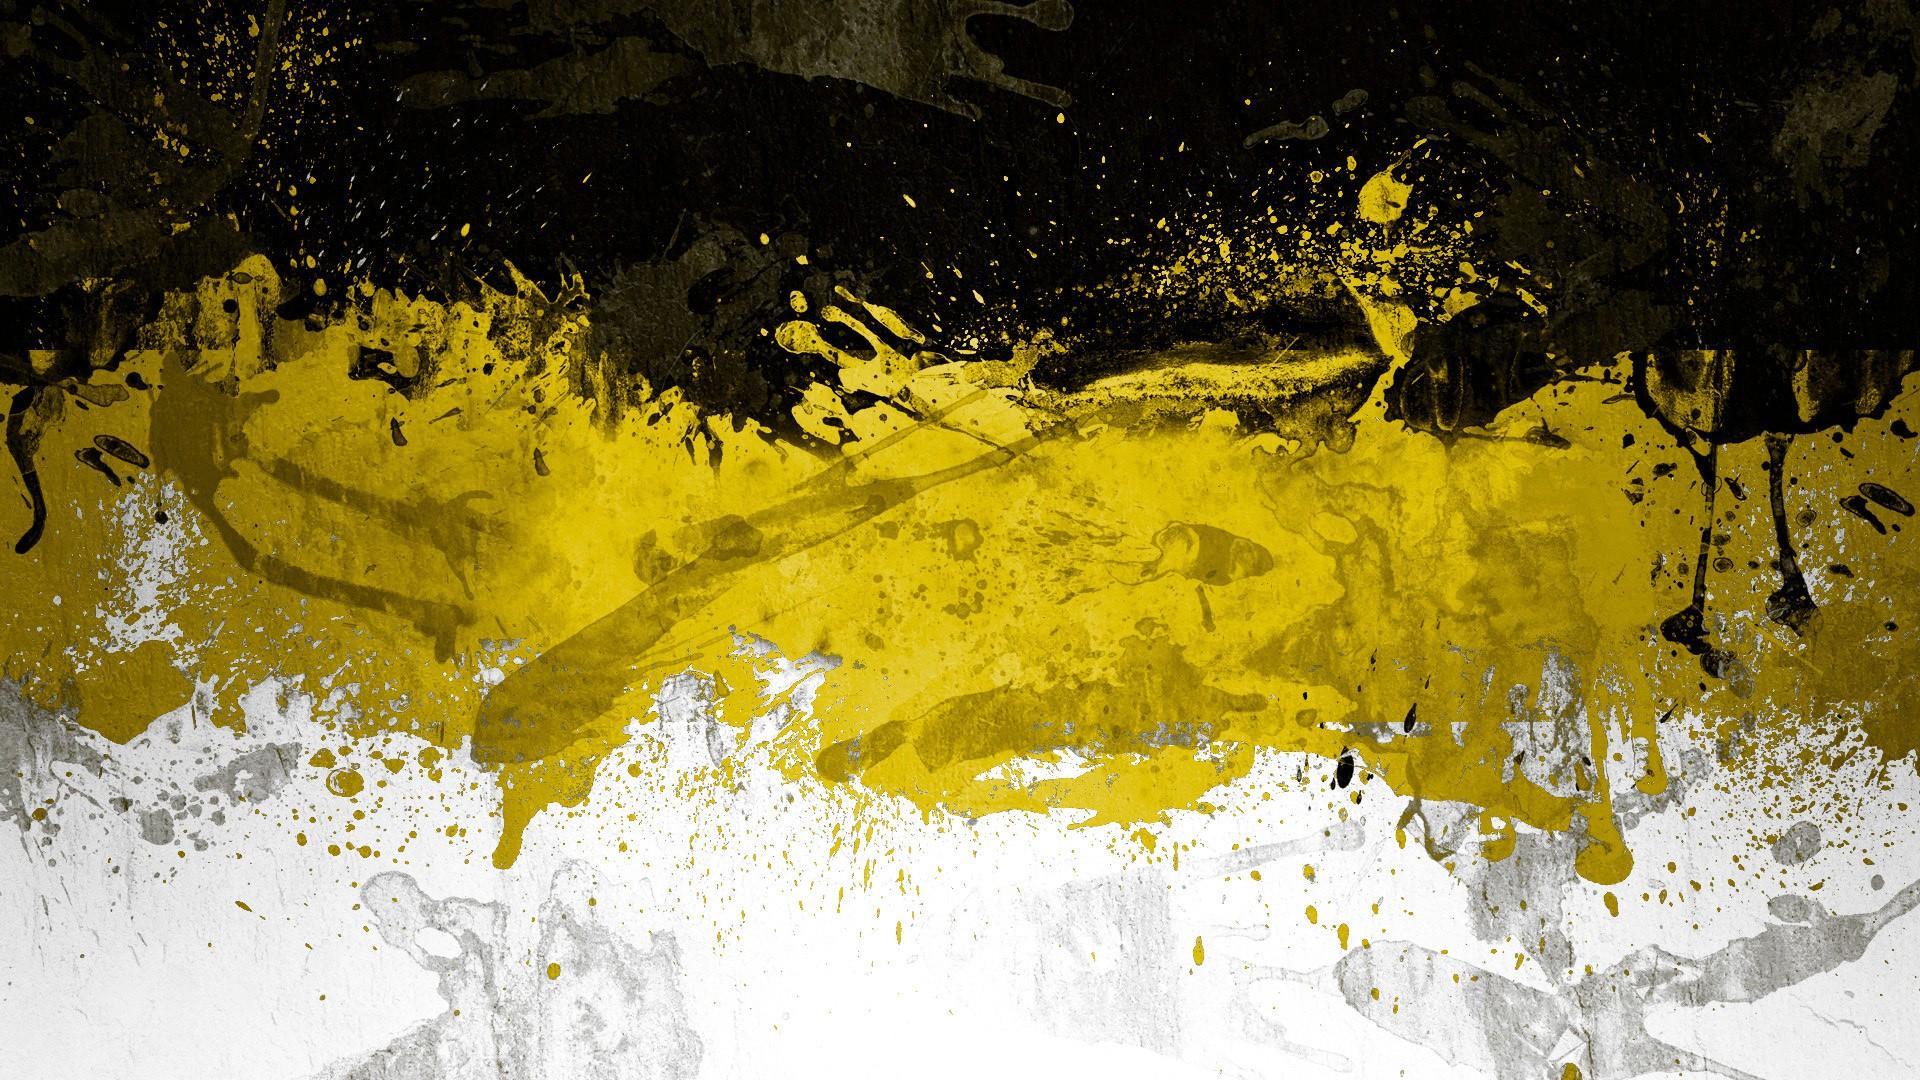 Black And Yellow Wallpaper 24 Hd Wallpaper ...